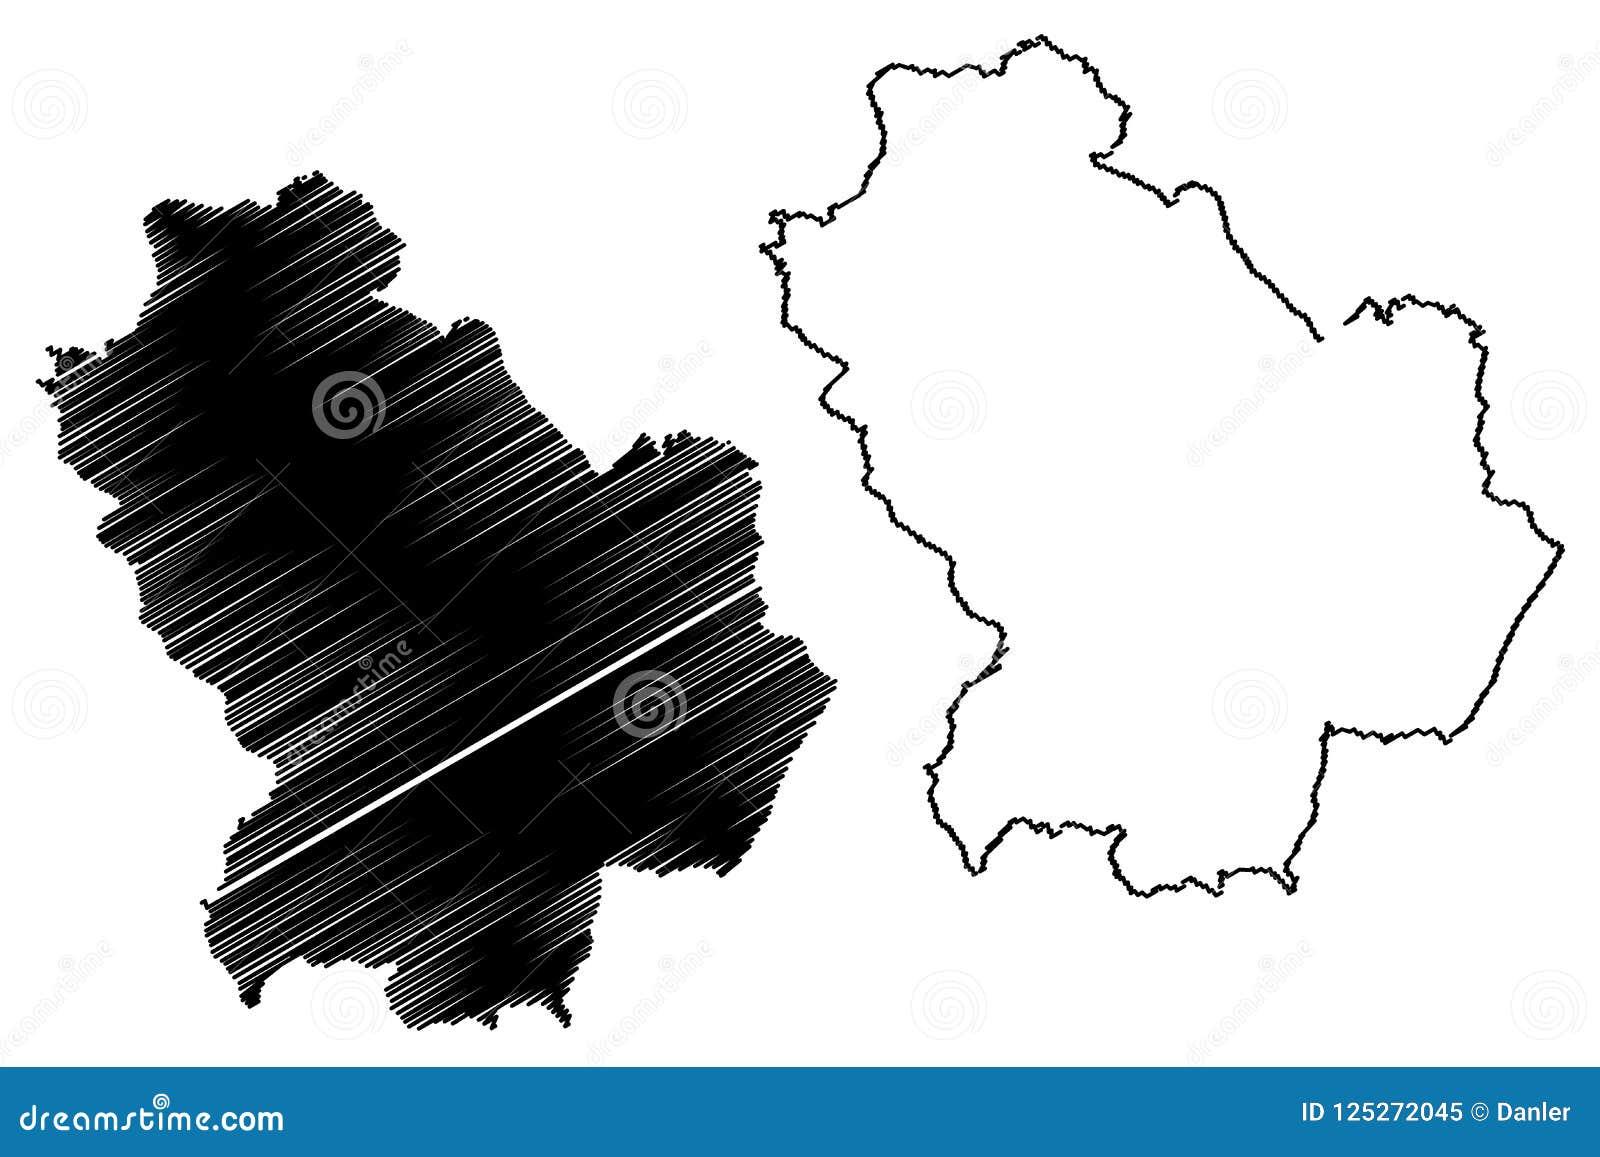 Basilicata Map Vector Stock Vector Illustration Of Illustration